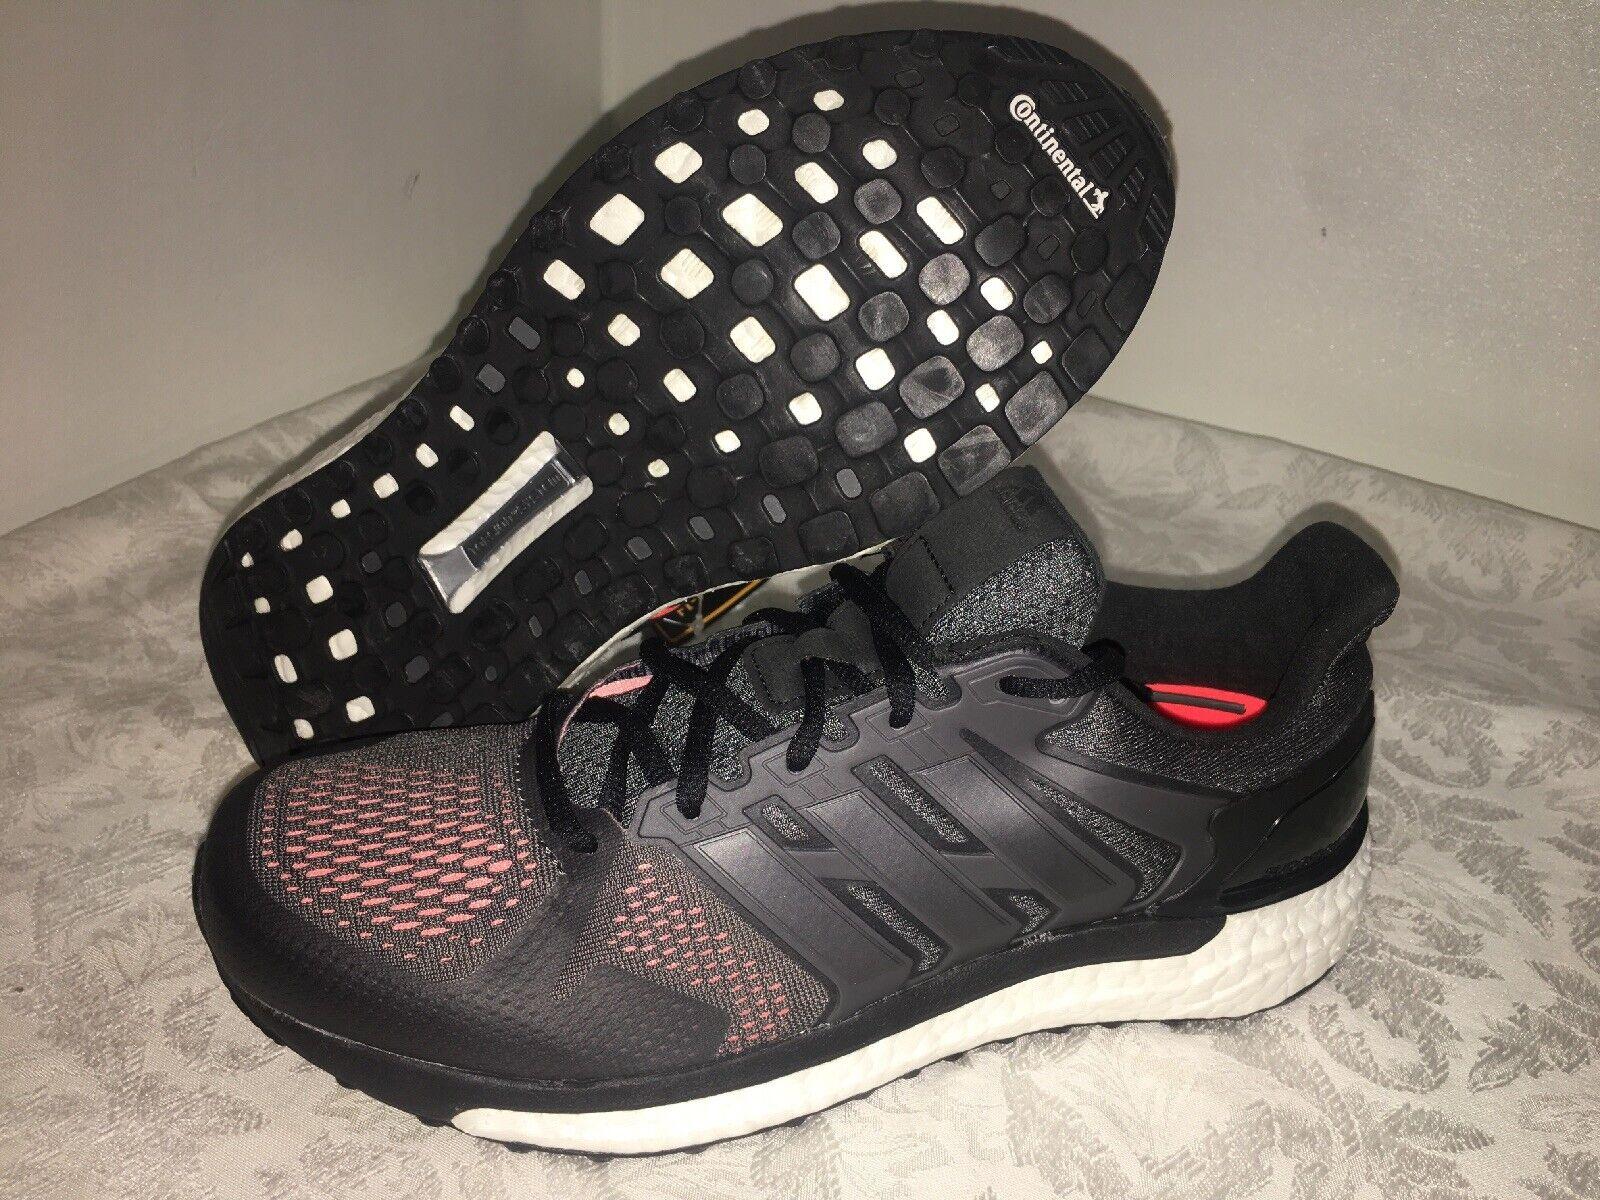 b2ddeae6fba Adidas Supernova Supernova Supernova St CG3063 Running shoes Men ...